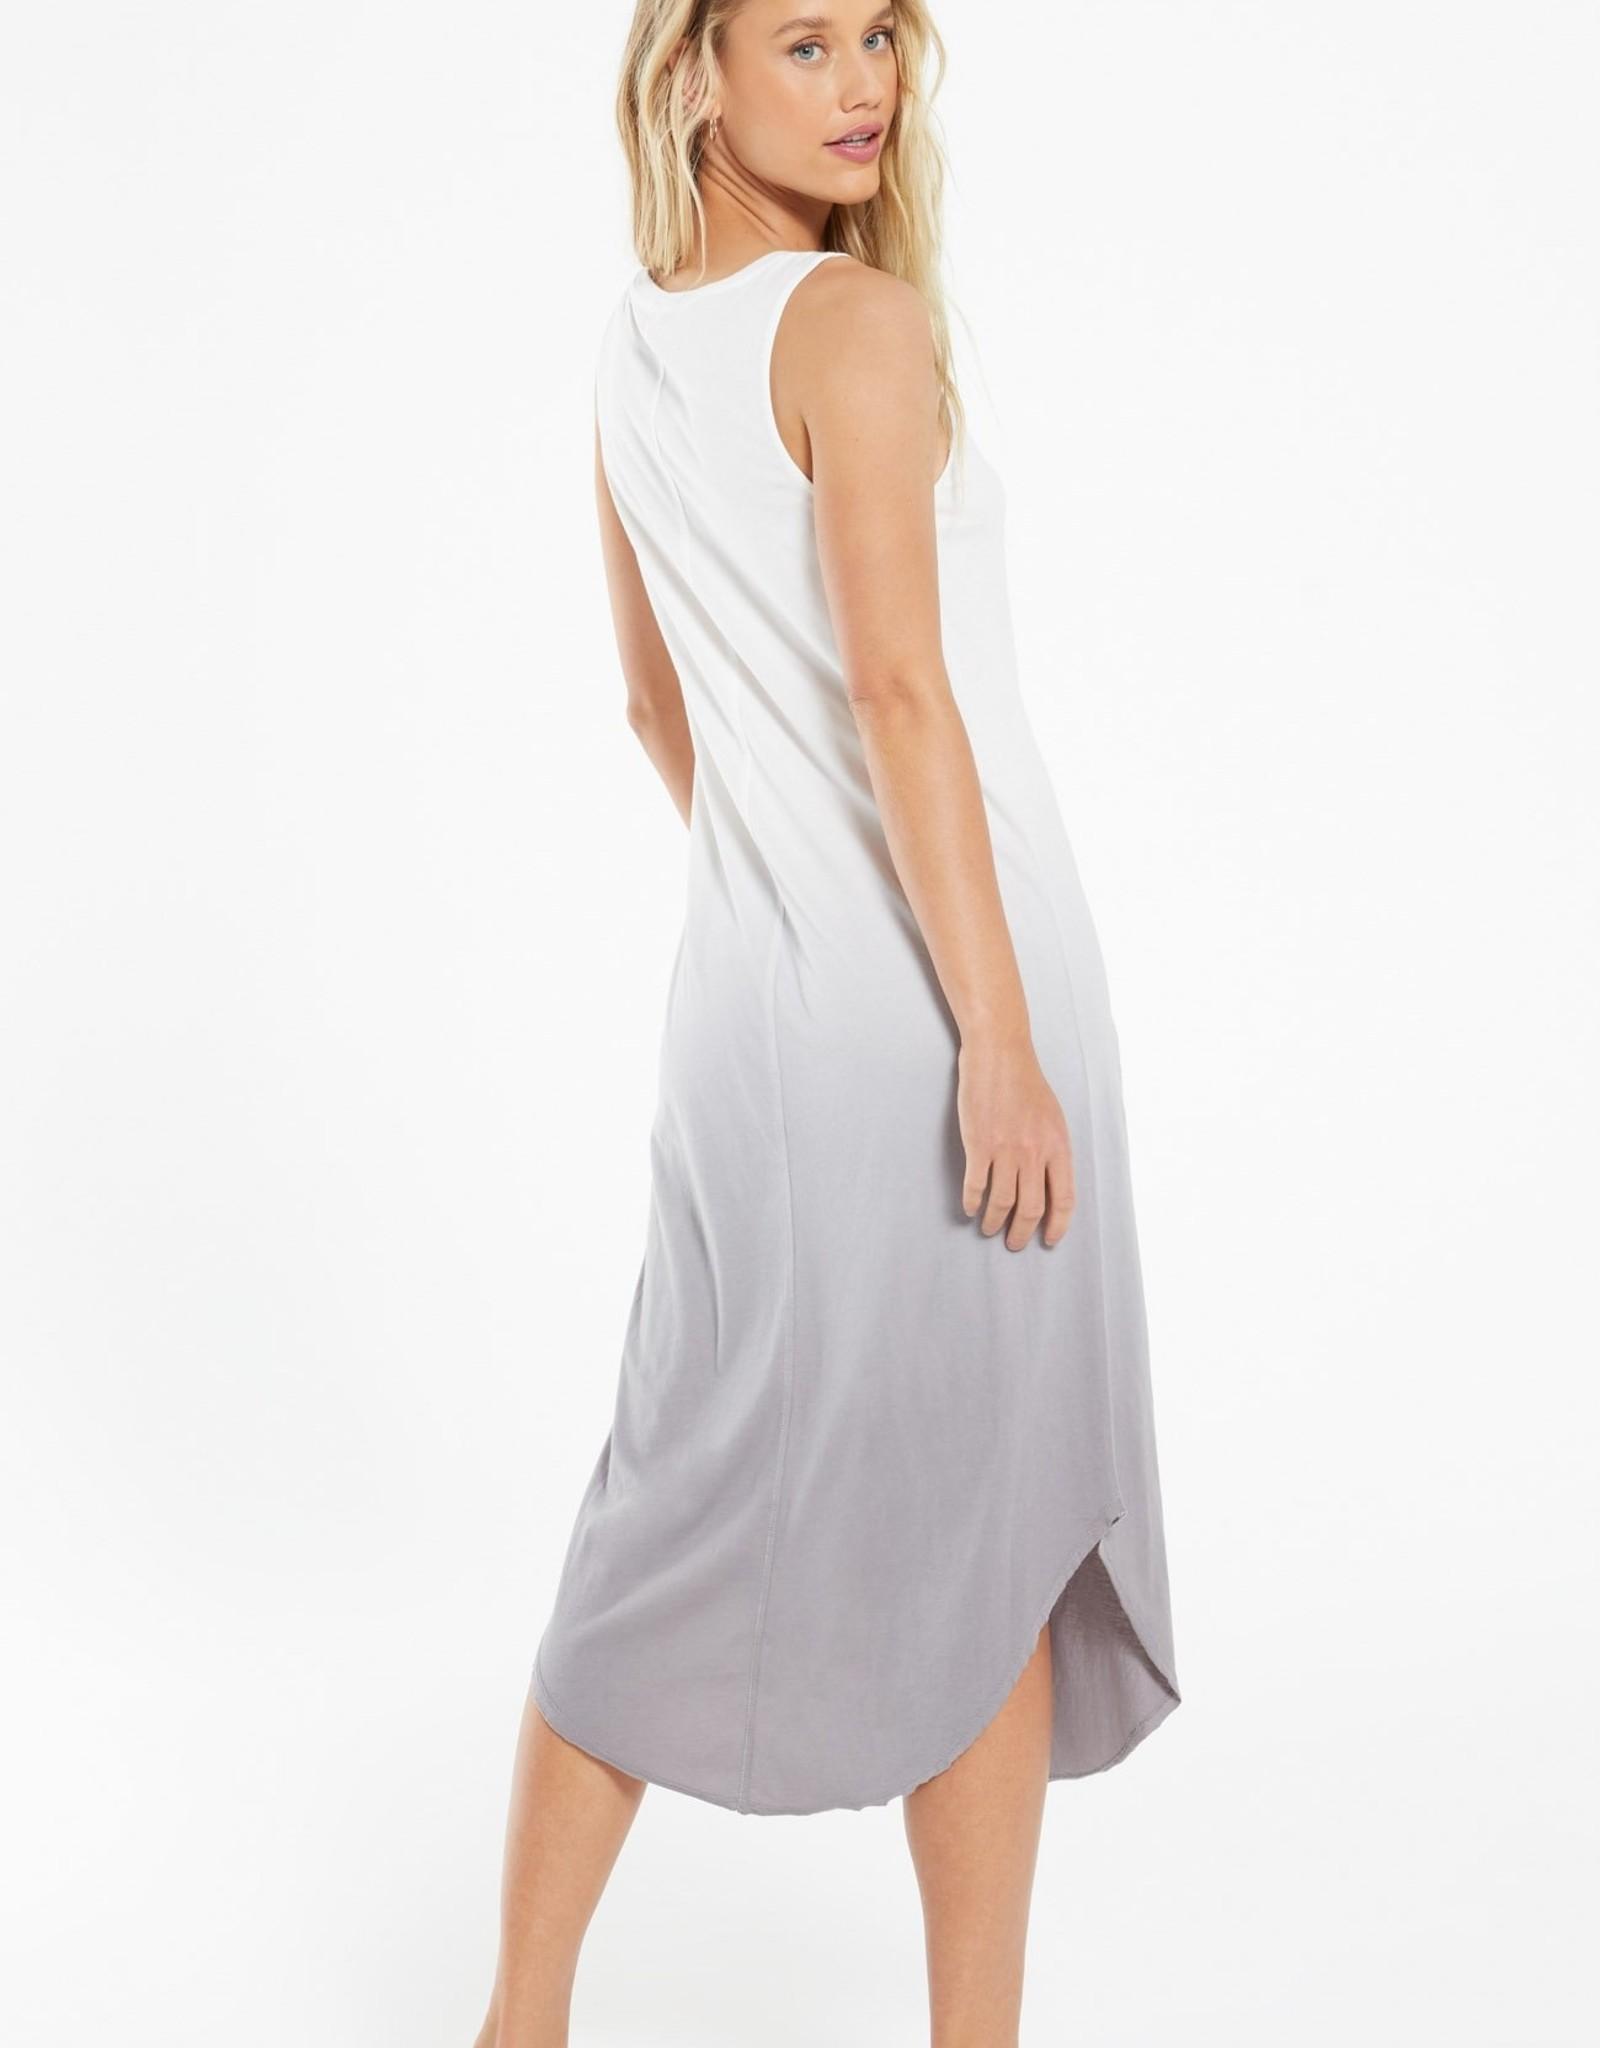 Z Supply Reverie Scoop Dip-Dye Dress